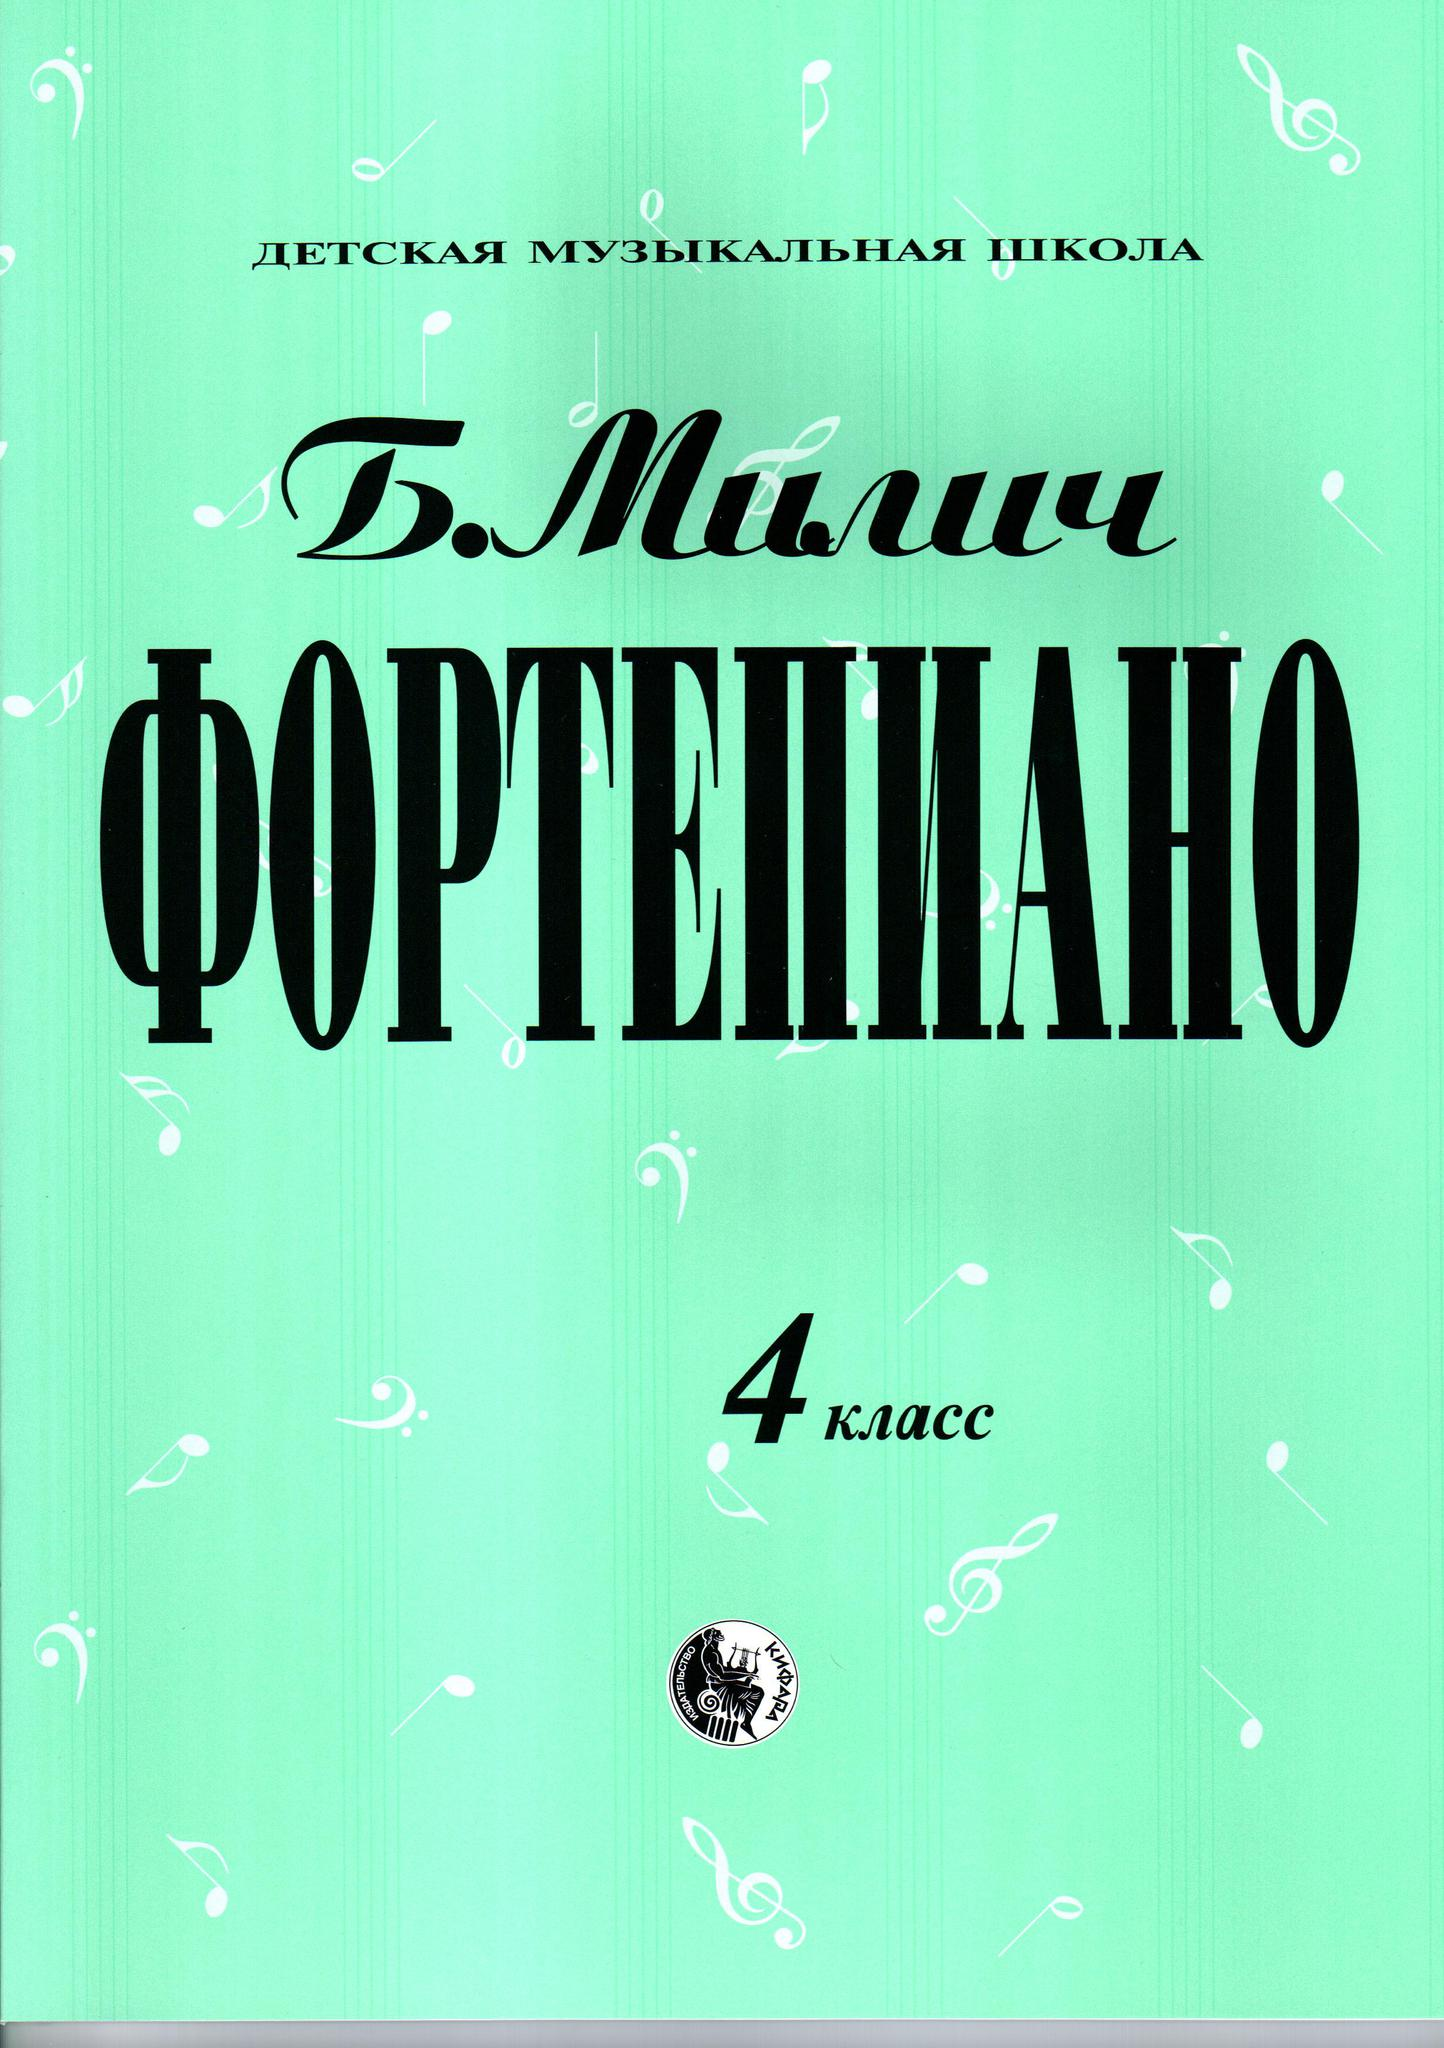 Милич Б. Фортепиано. 4 класс ДМШ